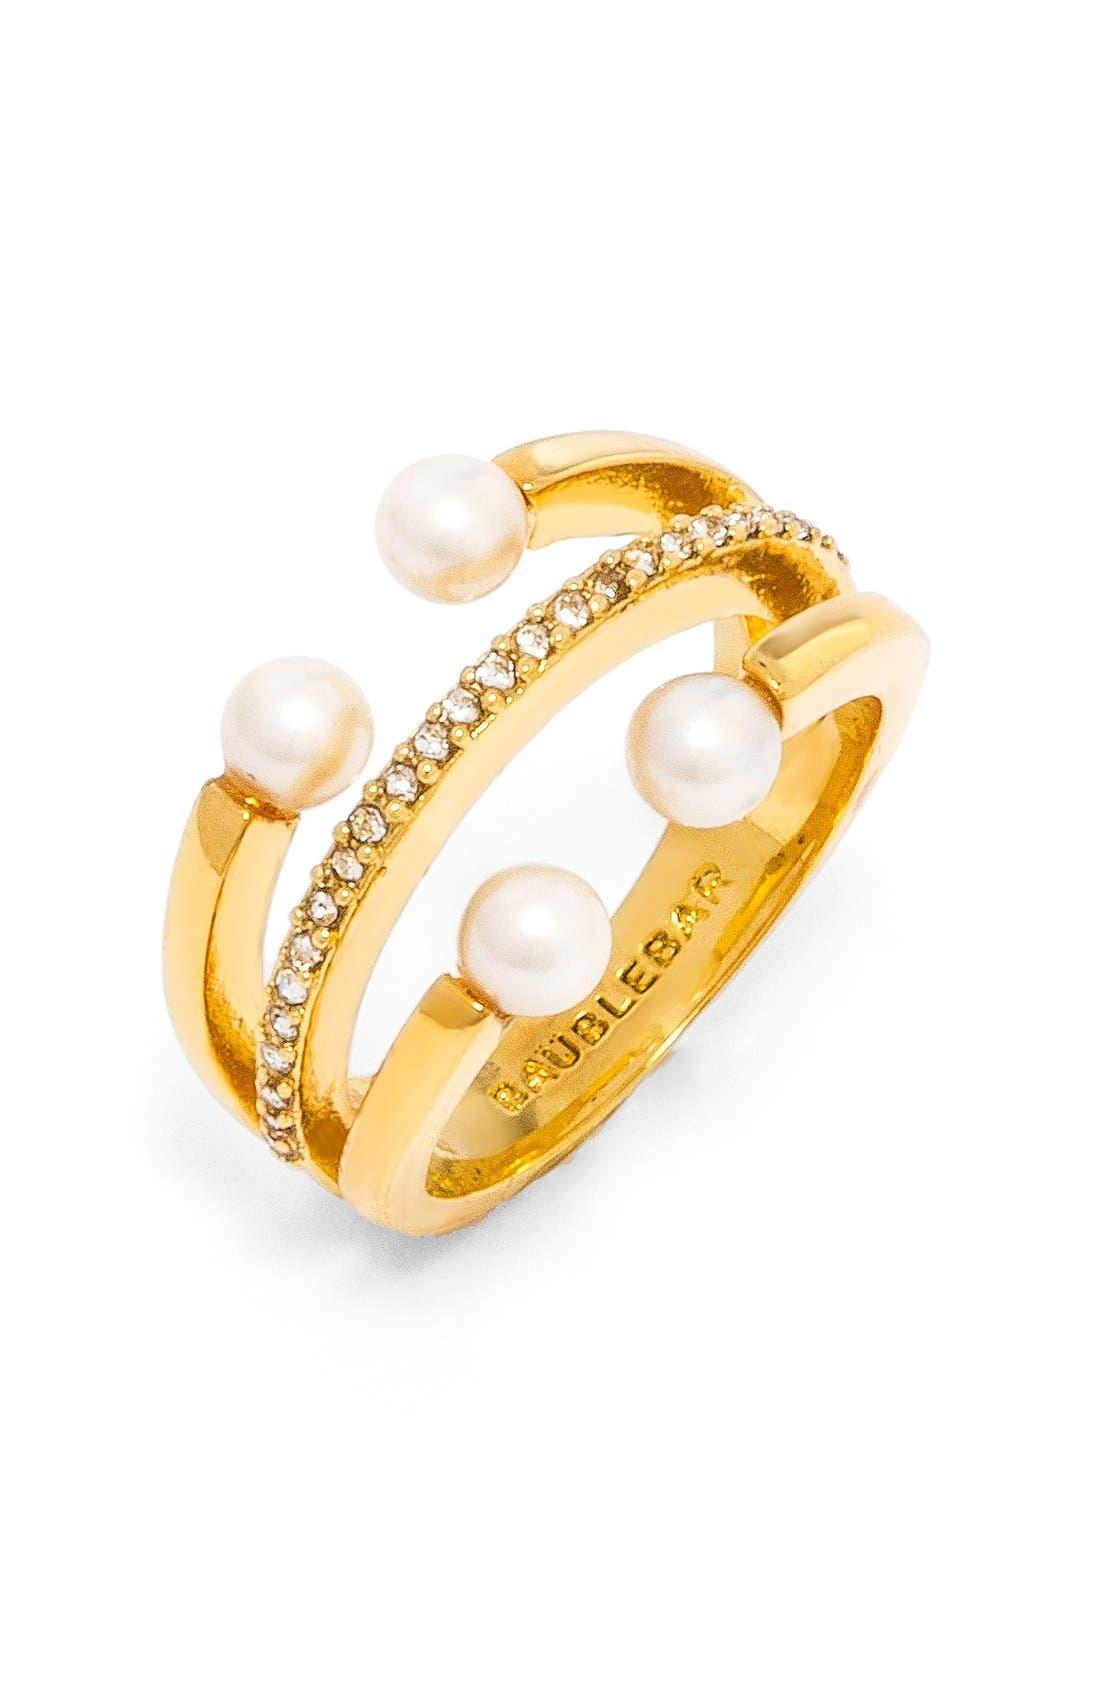 Main Image - BaubleBar 'Mag' Ring